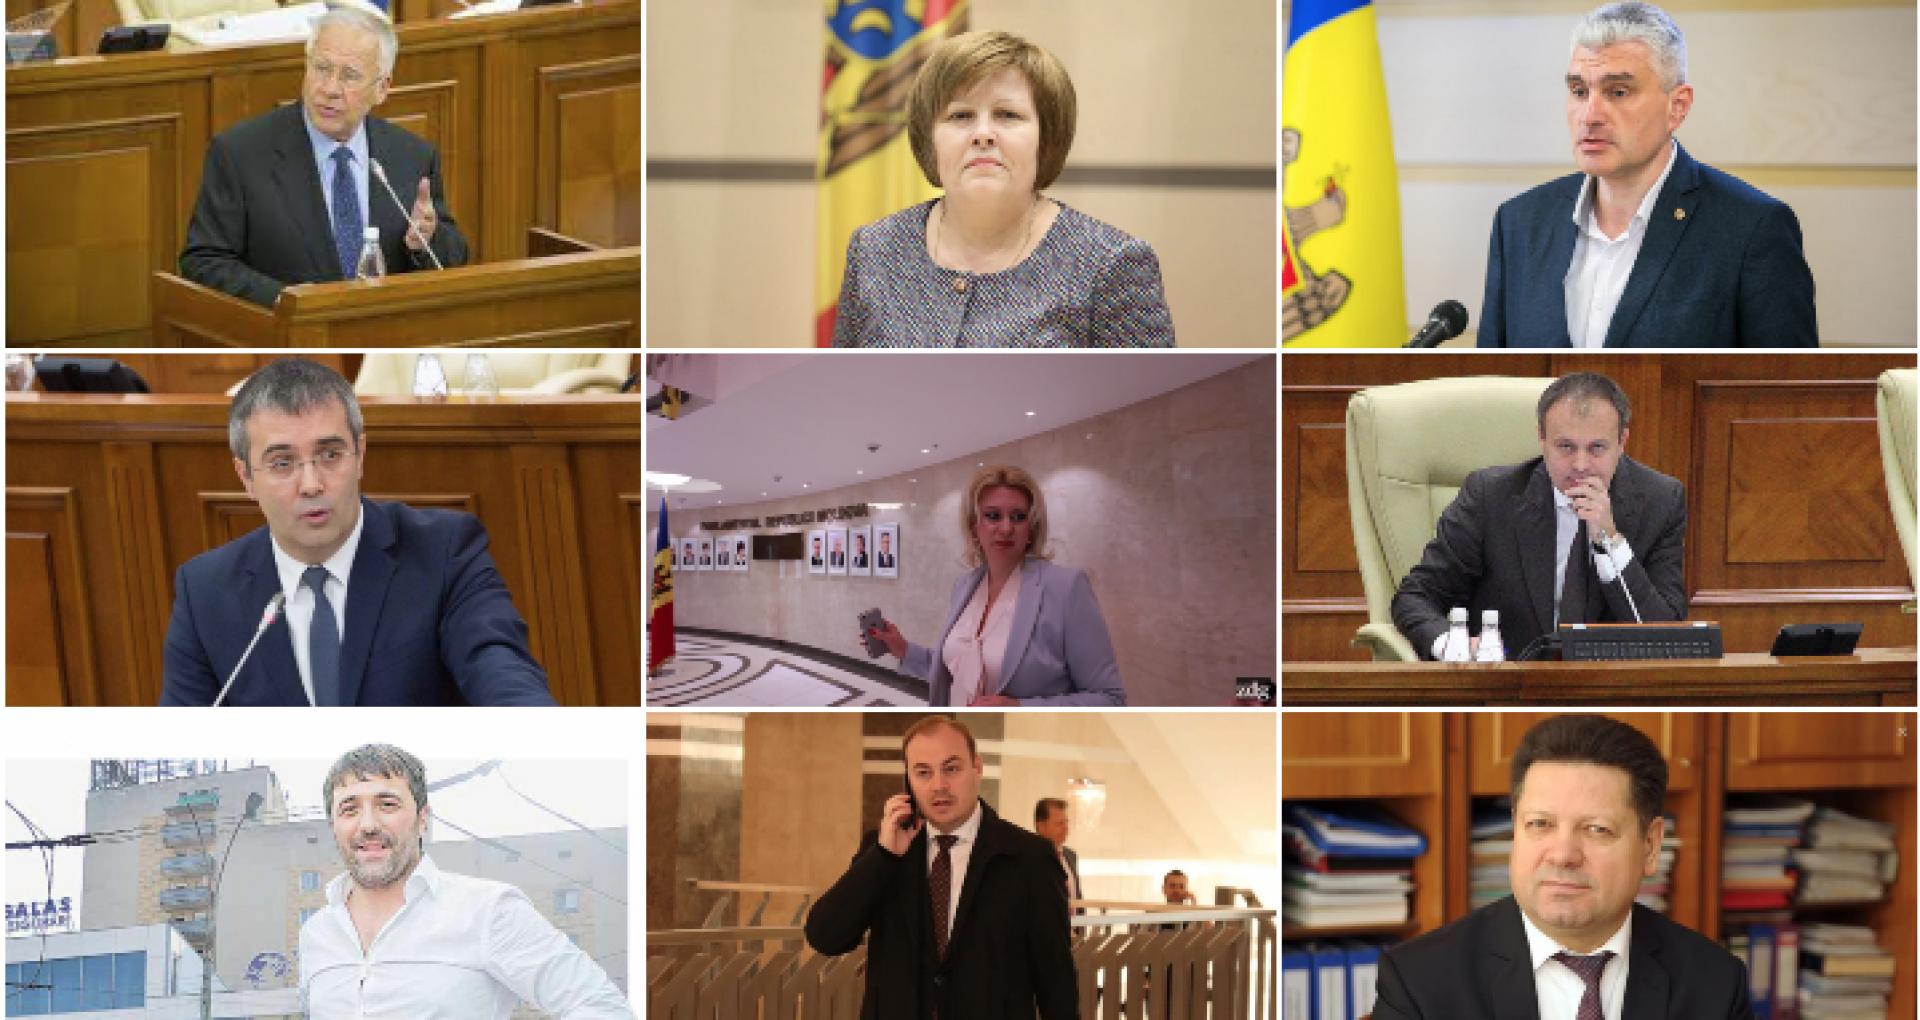 Transfugii  Ivanov, Sîrbu, Nichiforciuc, Andronachi, finul lui Plahotniuc, Candu și medicul-deputat Gațcan. Lista ex-parlamentarilor care nu mai prind un loc în Parlament